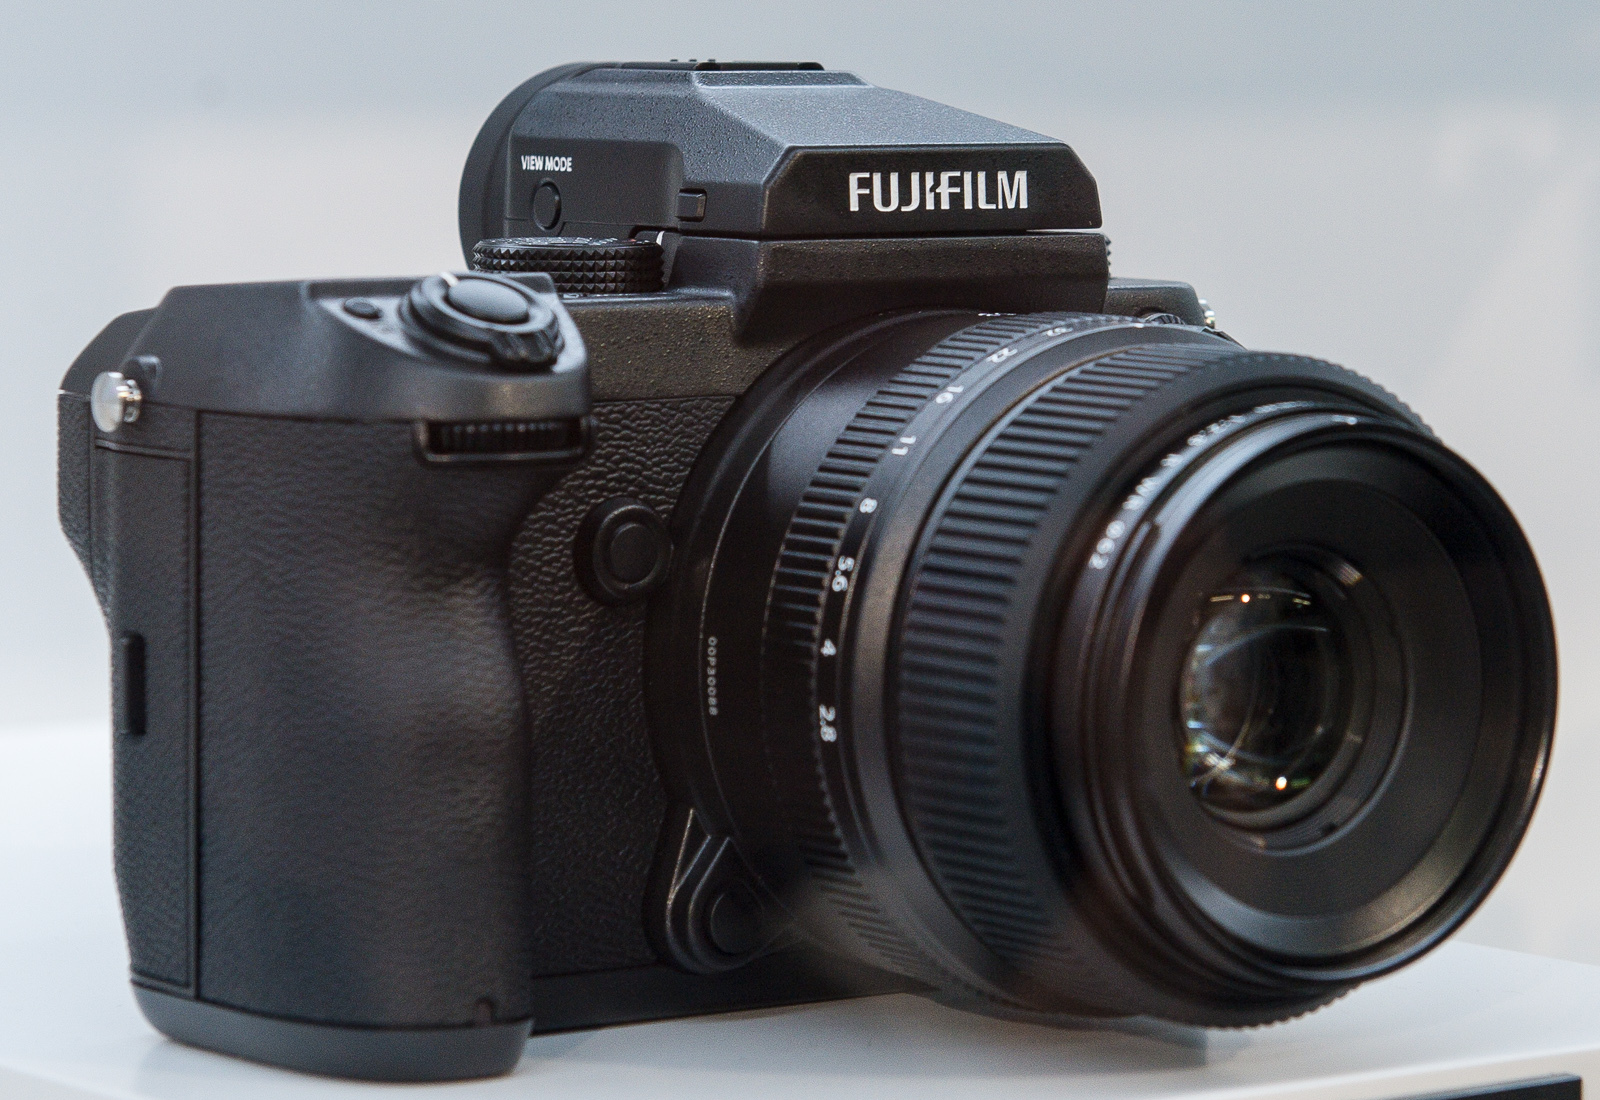 Fujifilm Gfx 50s Wikipedia Fujinon Gf 120mm F 4 R Lm Ois Wr Macro